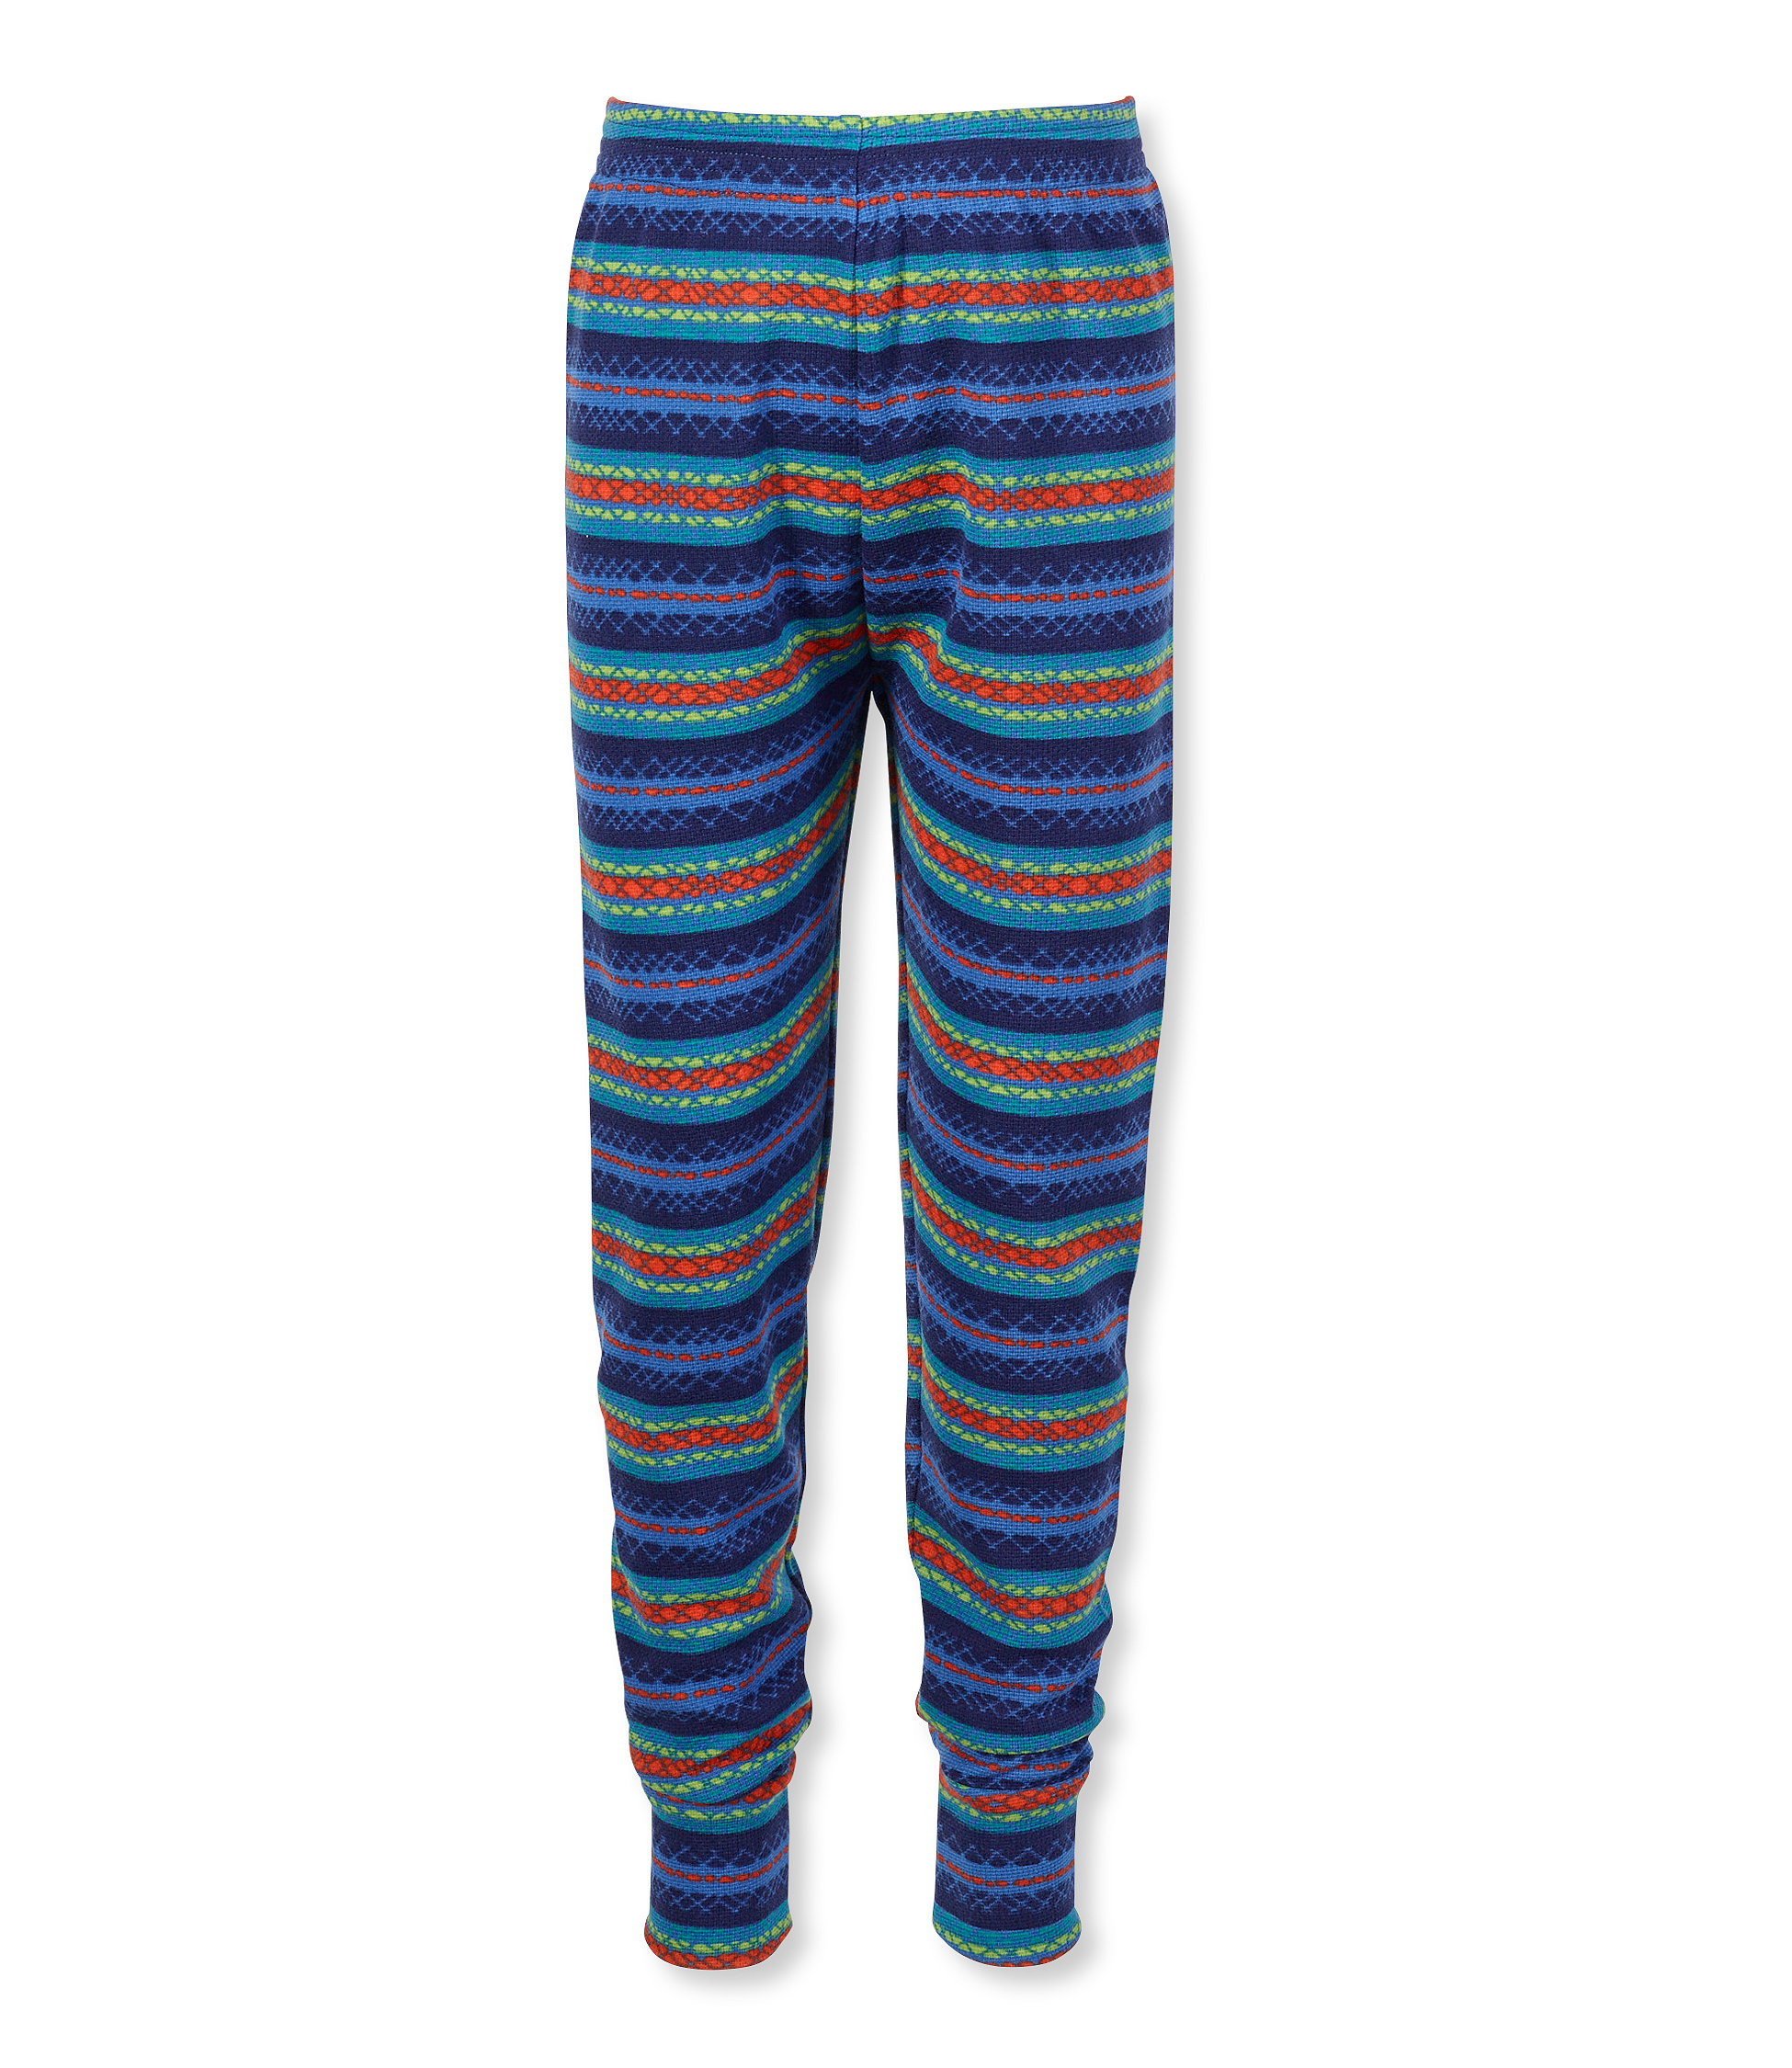 L.L.Bean Wicked Warm Midweight Underwear, Pants